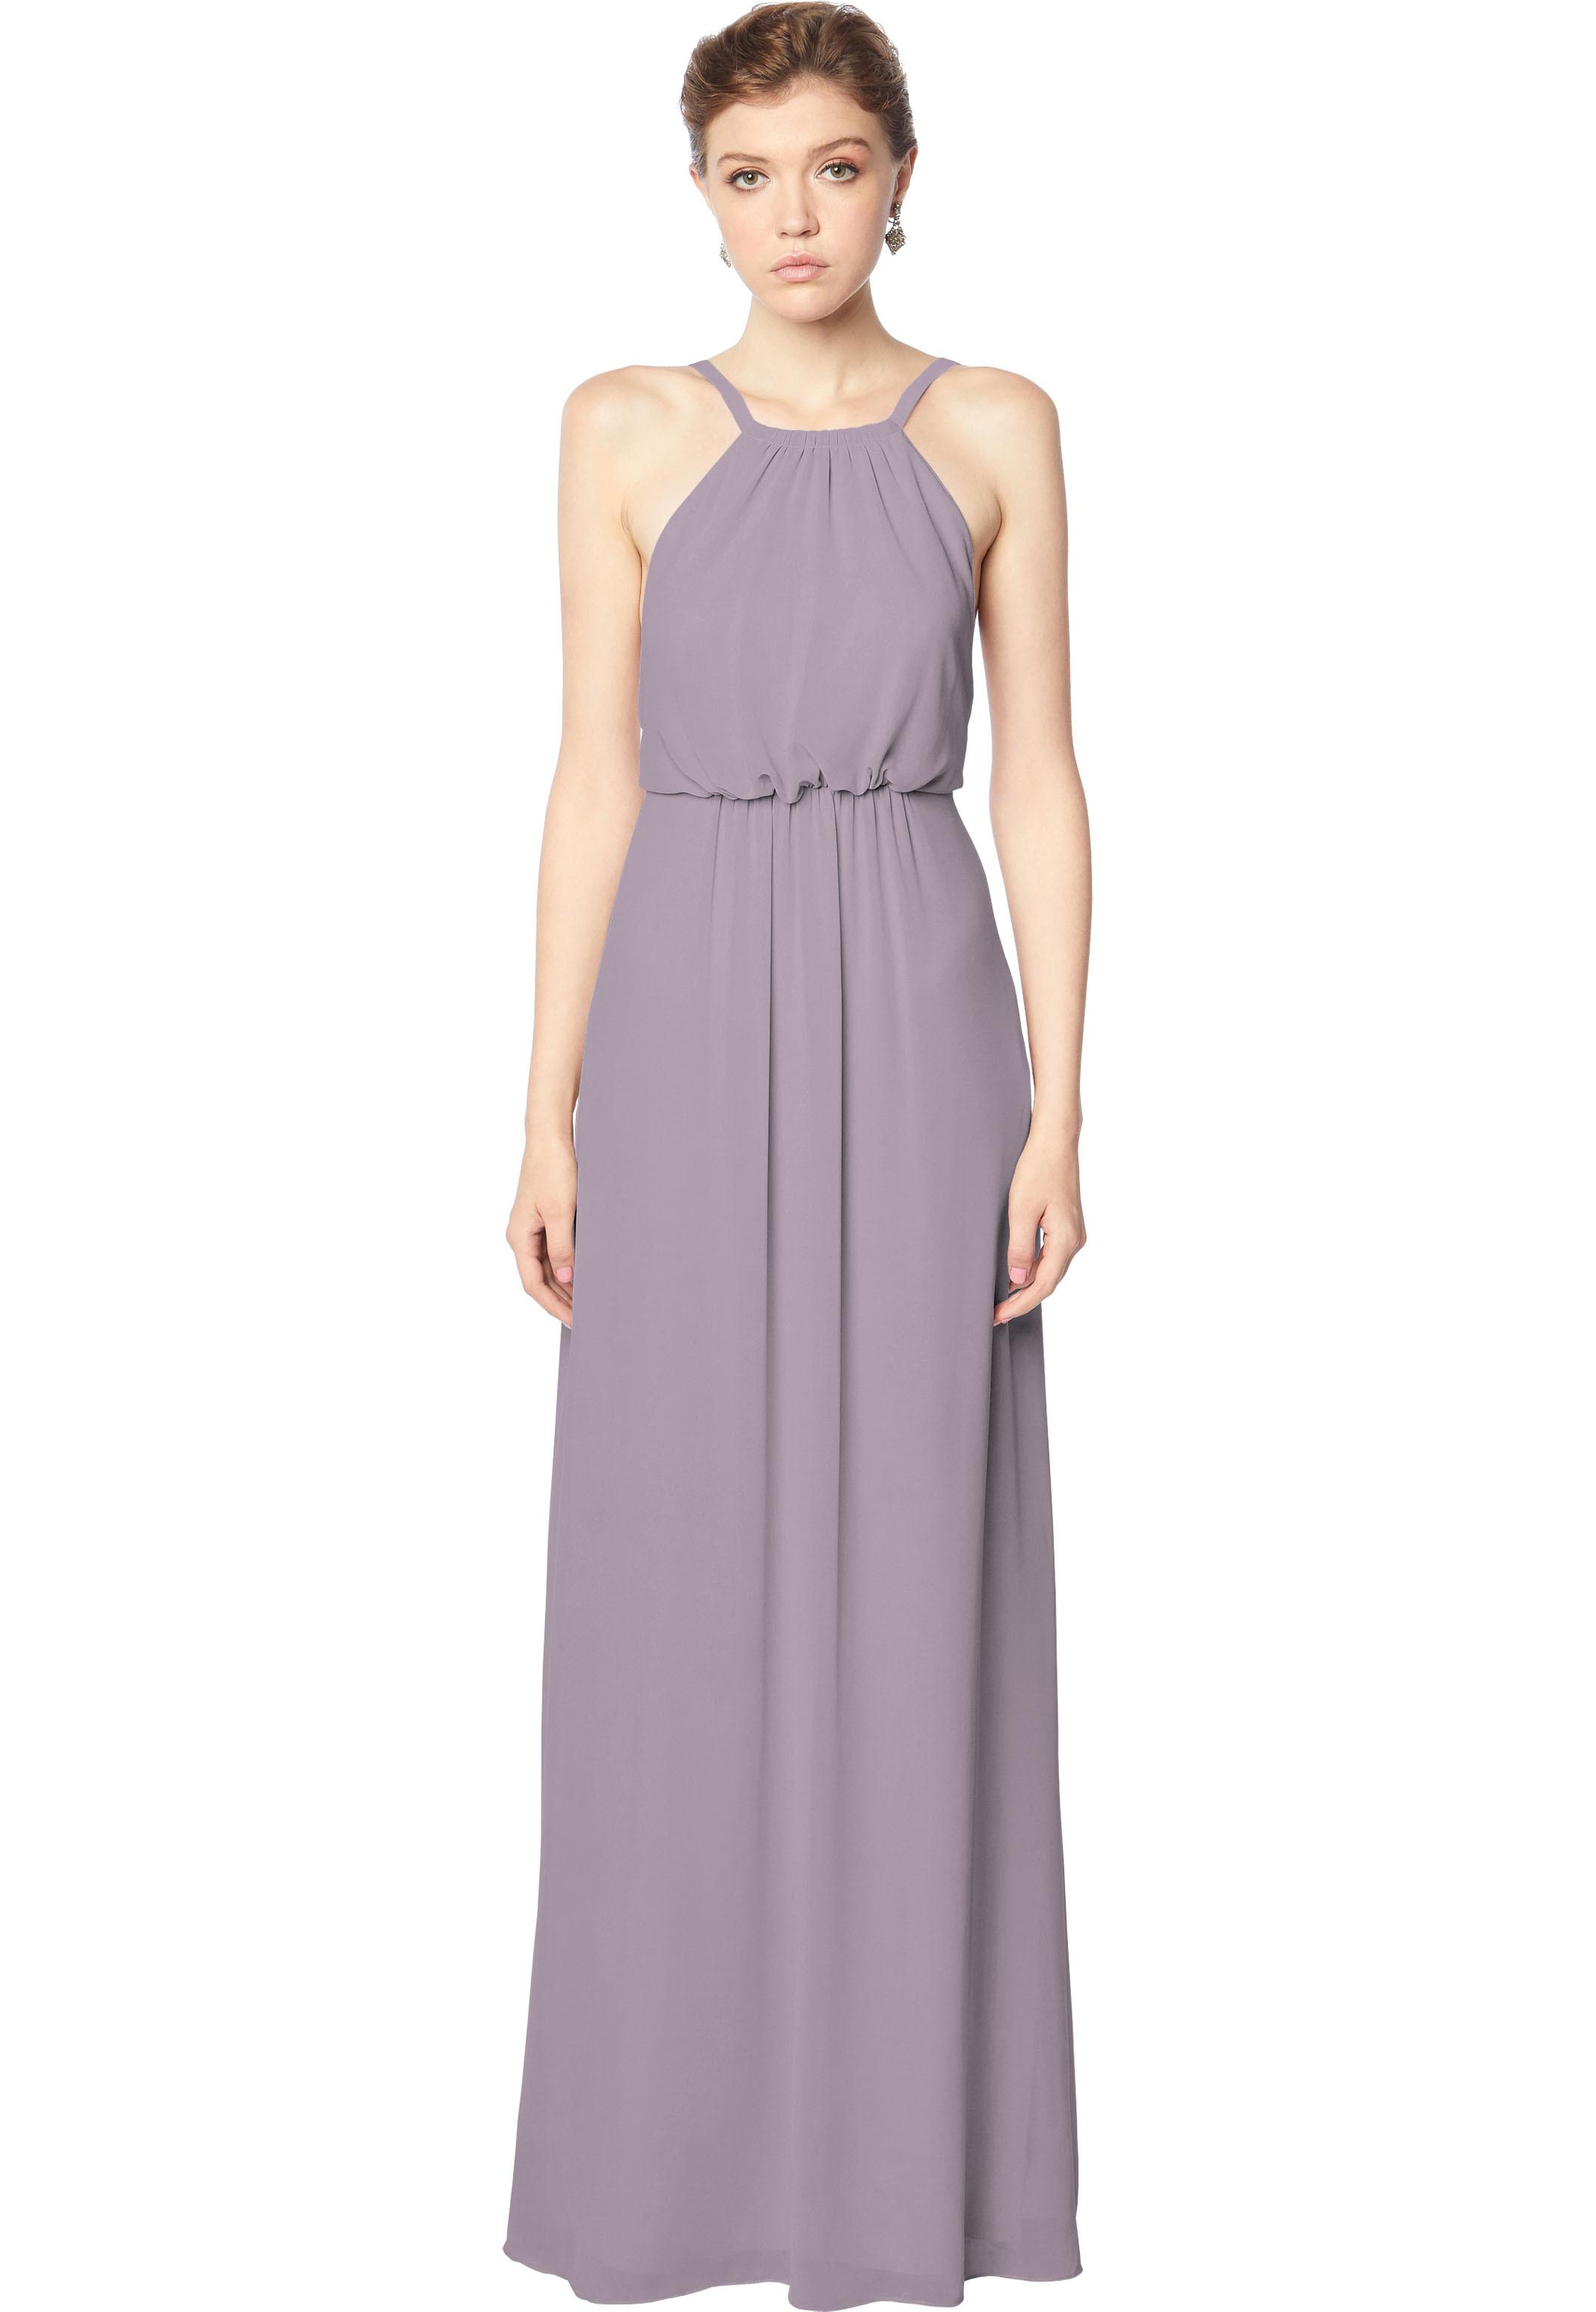 Bill Levkoff HEATHER Chiffon Blouson A-line gown, $158.00 Front